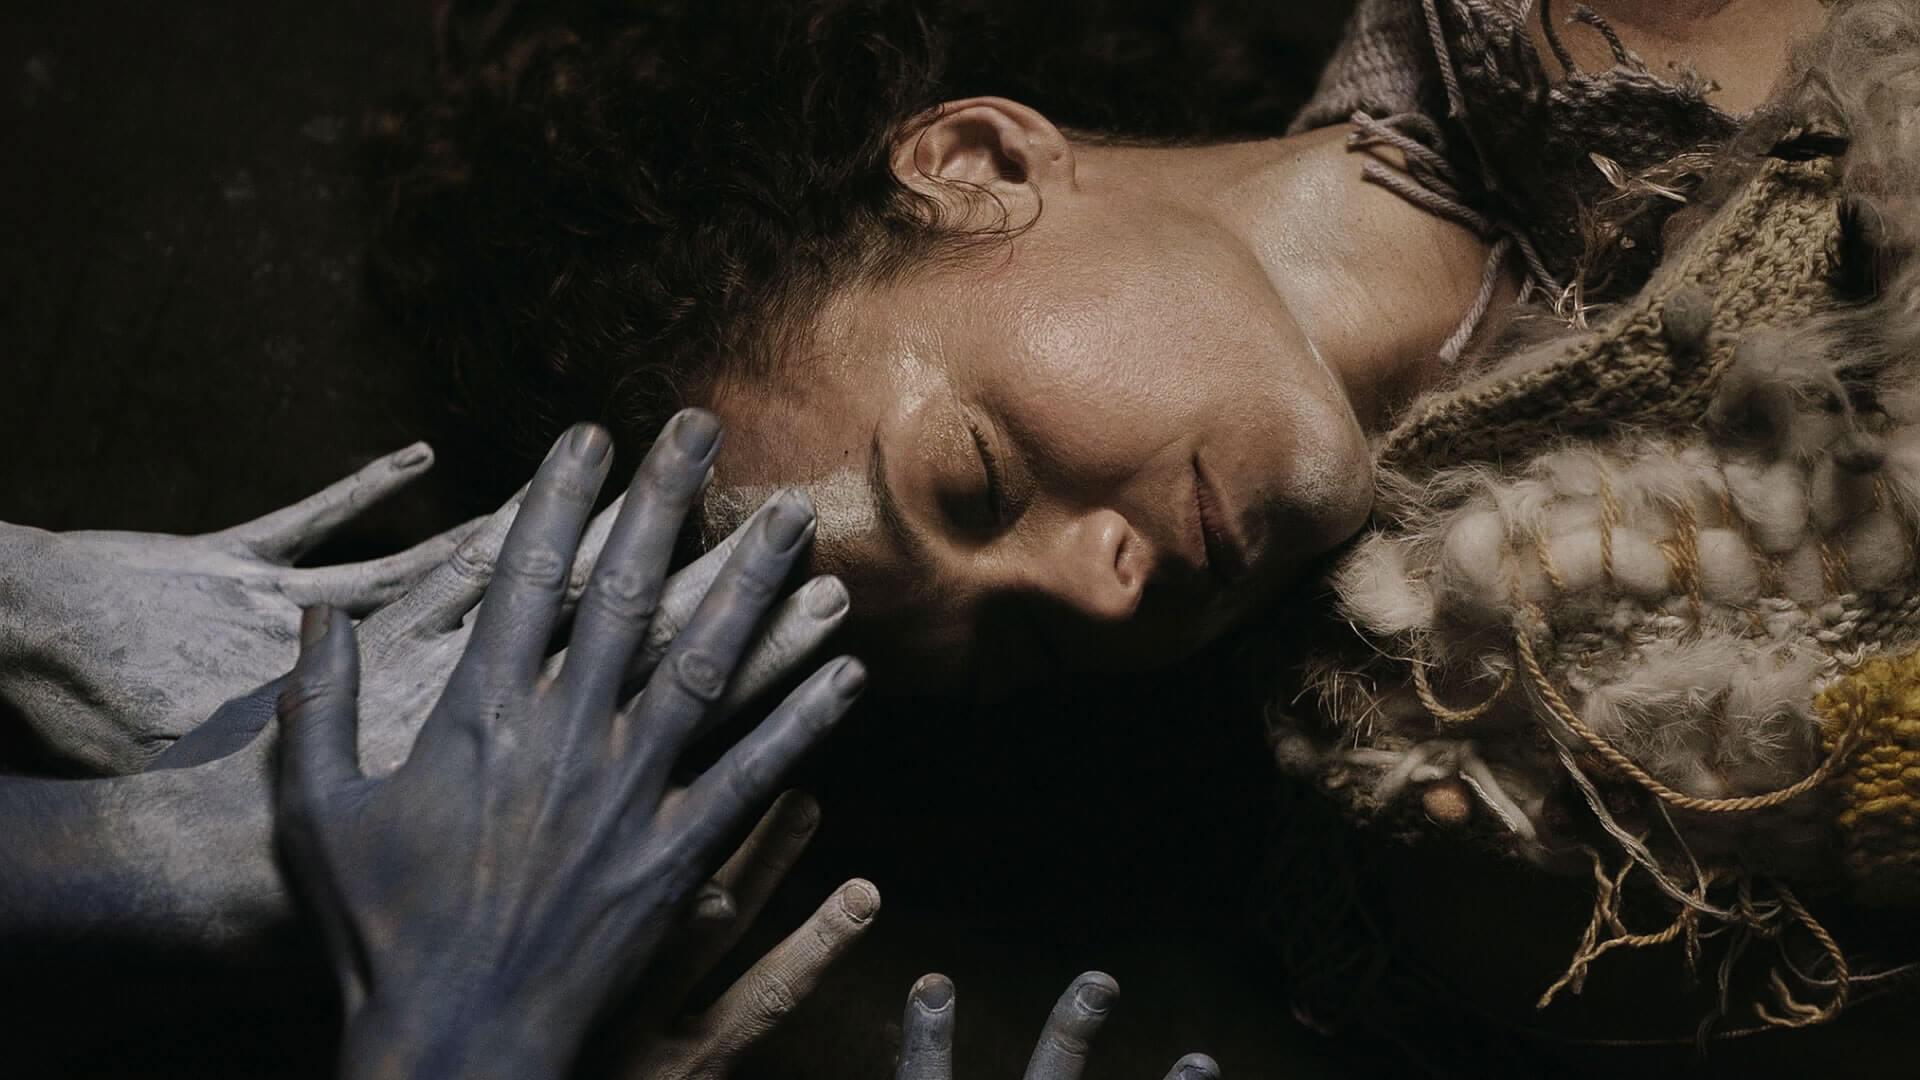 PALOMA DEL CERRO / Directed by Toni Balseiro & Nano Benayon